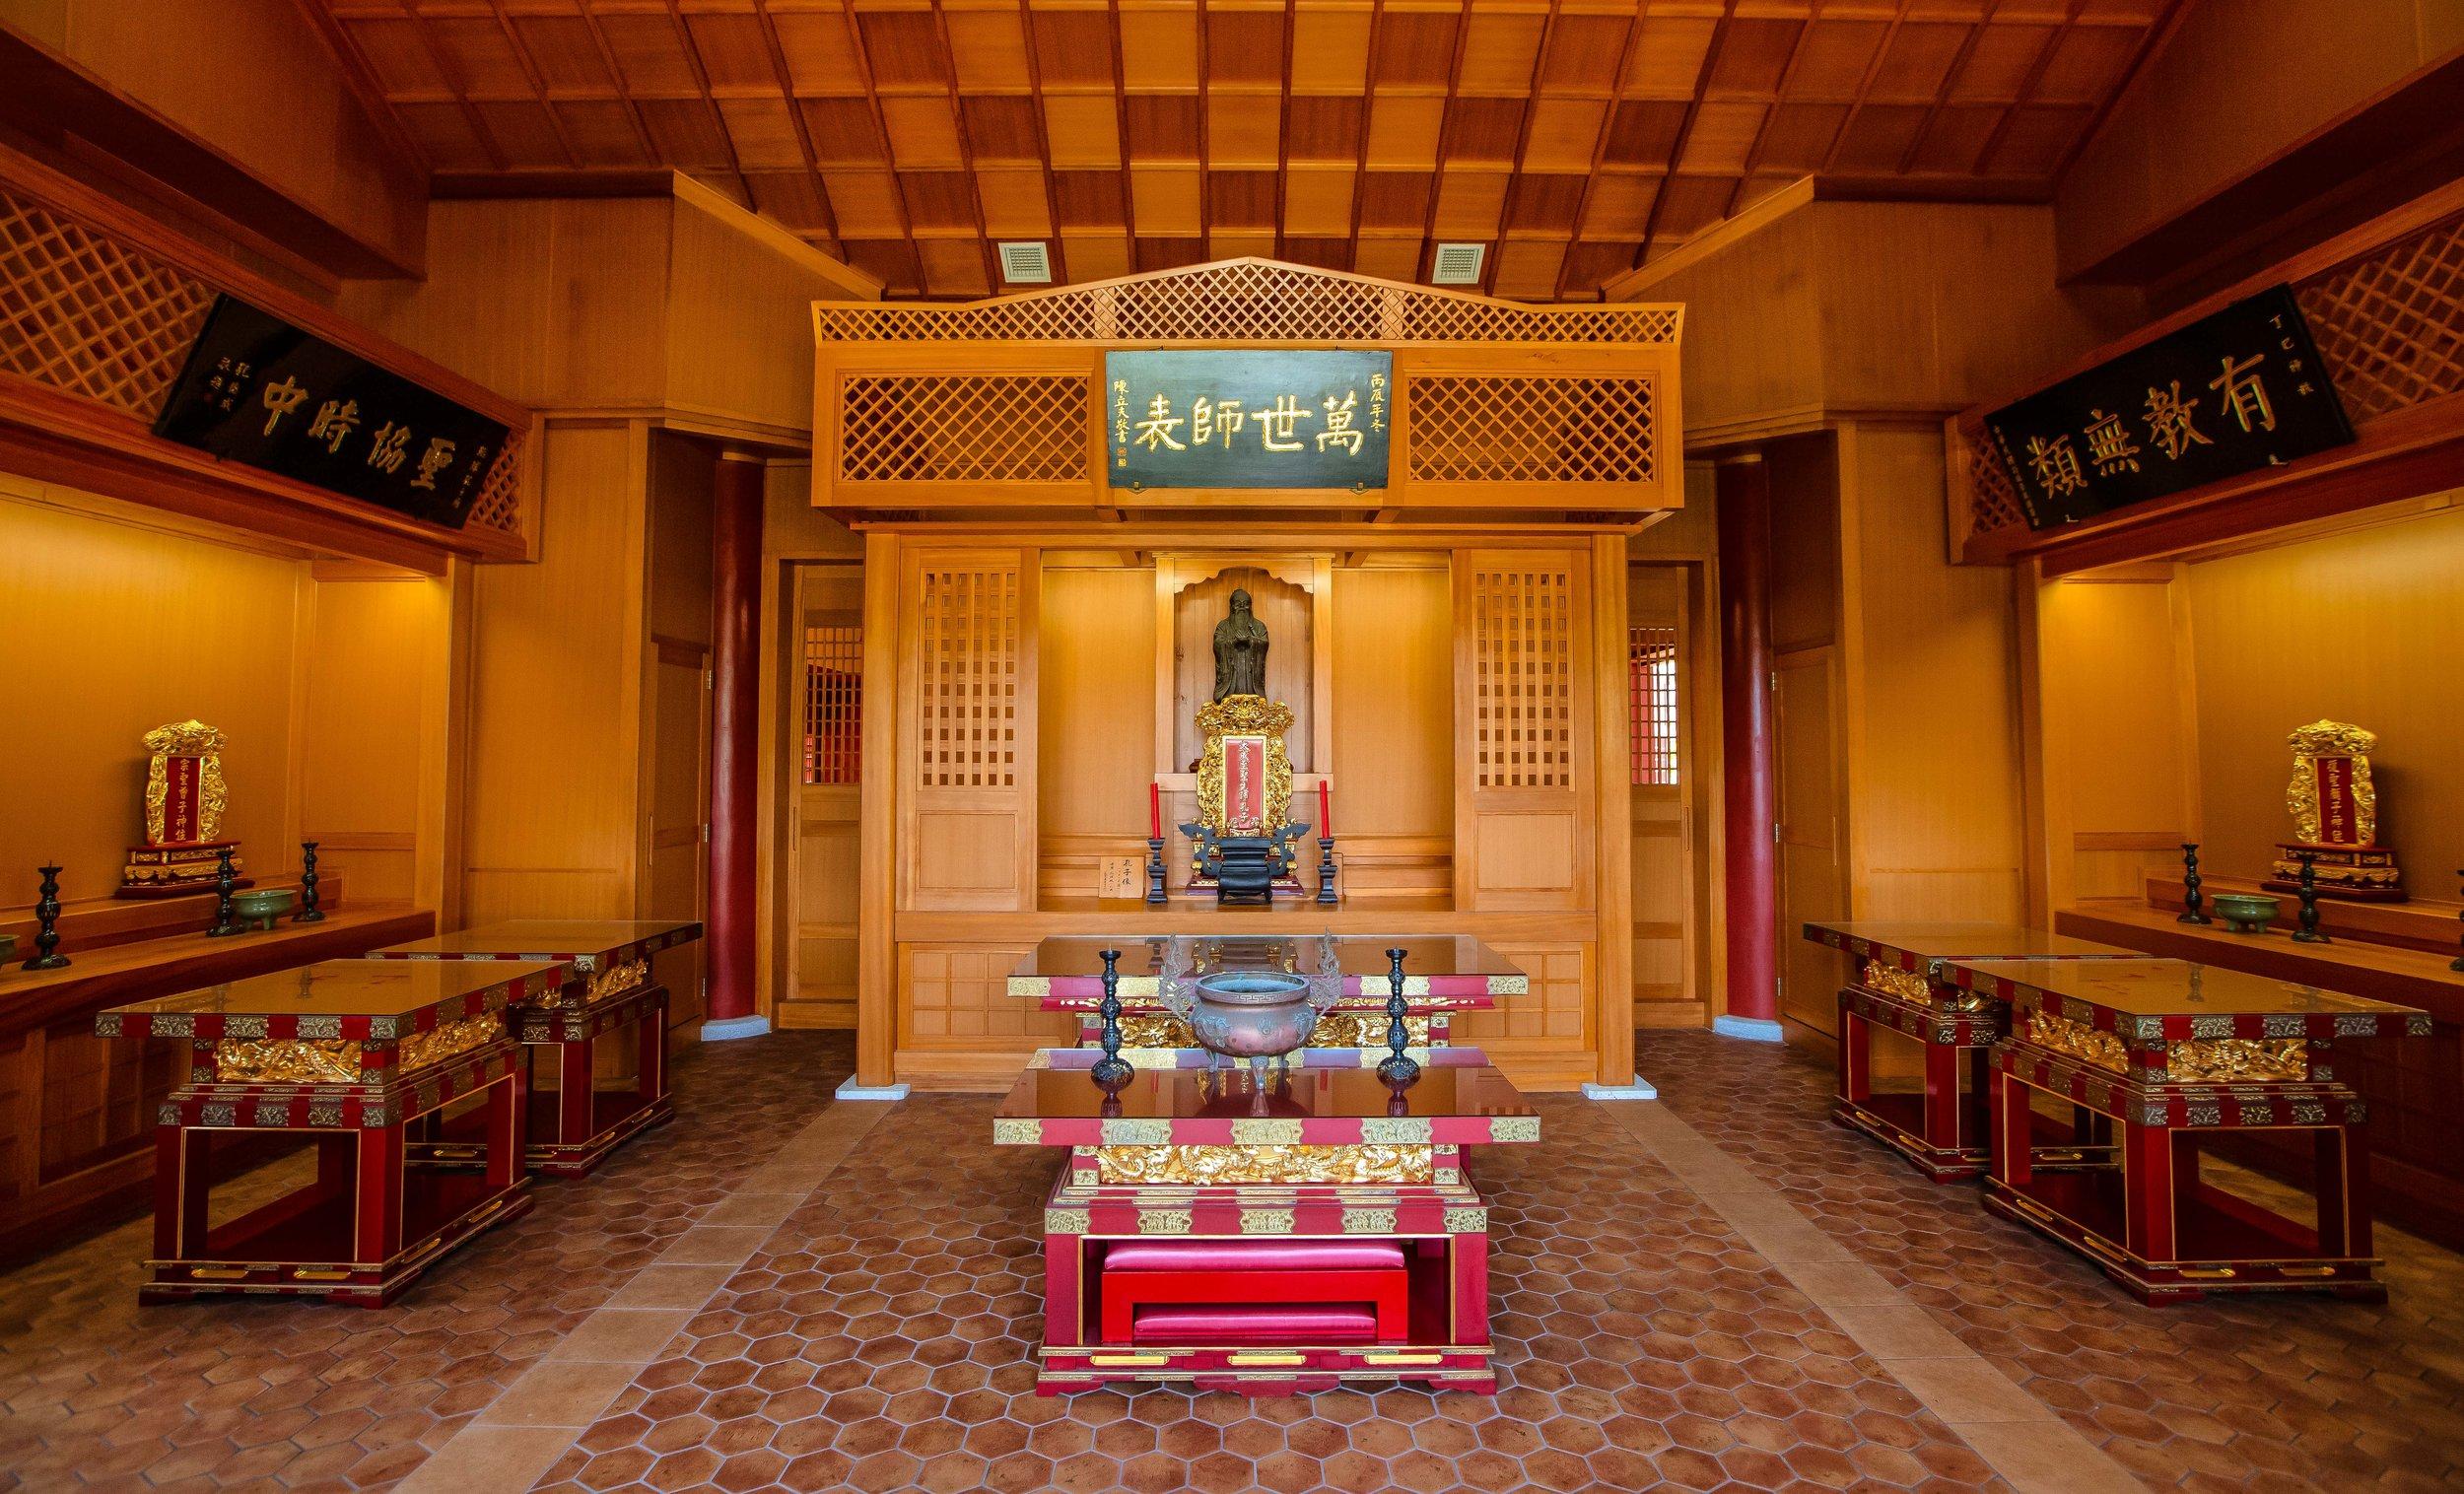 The shrine room of the Naha Confucius Temple